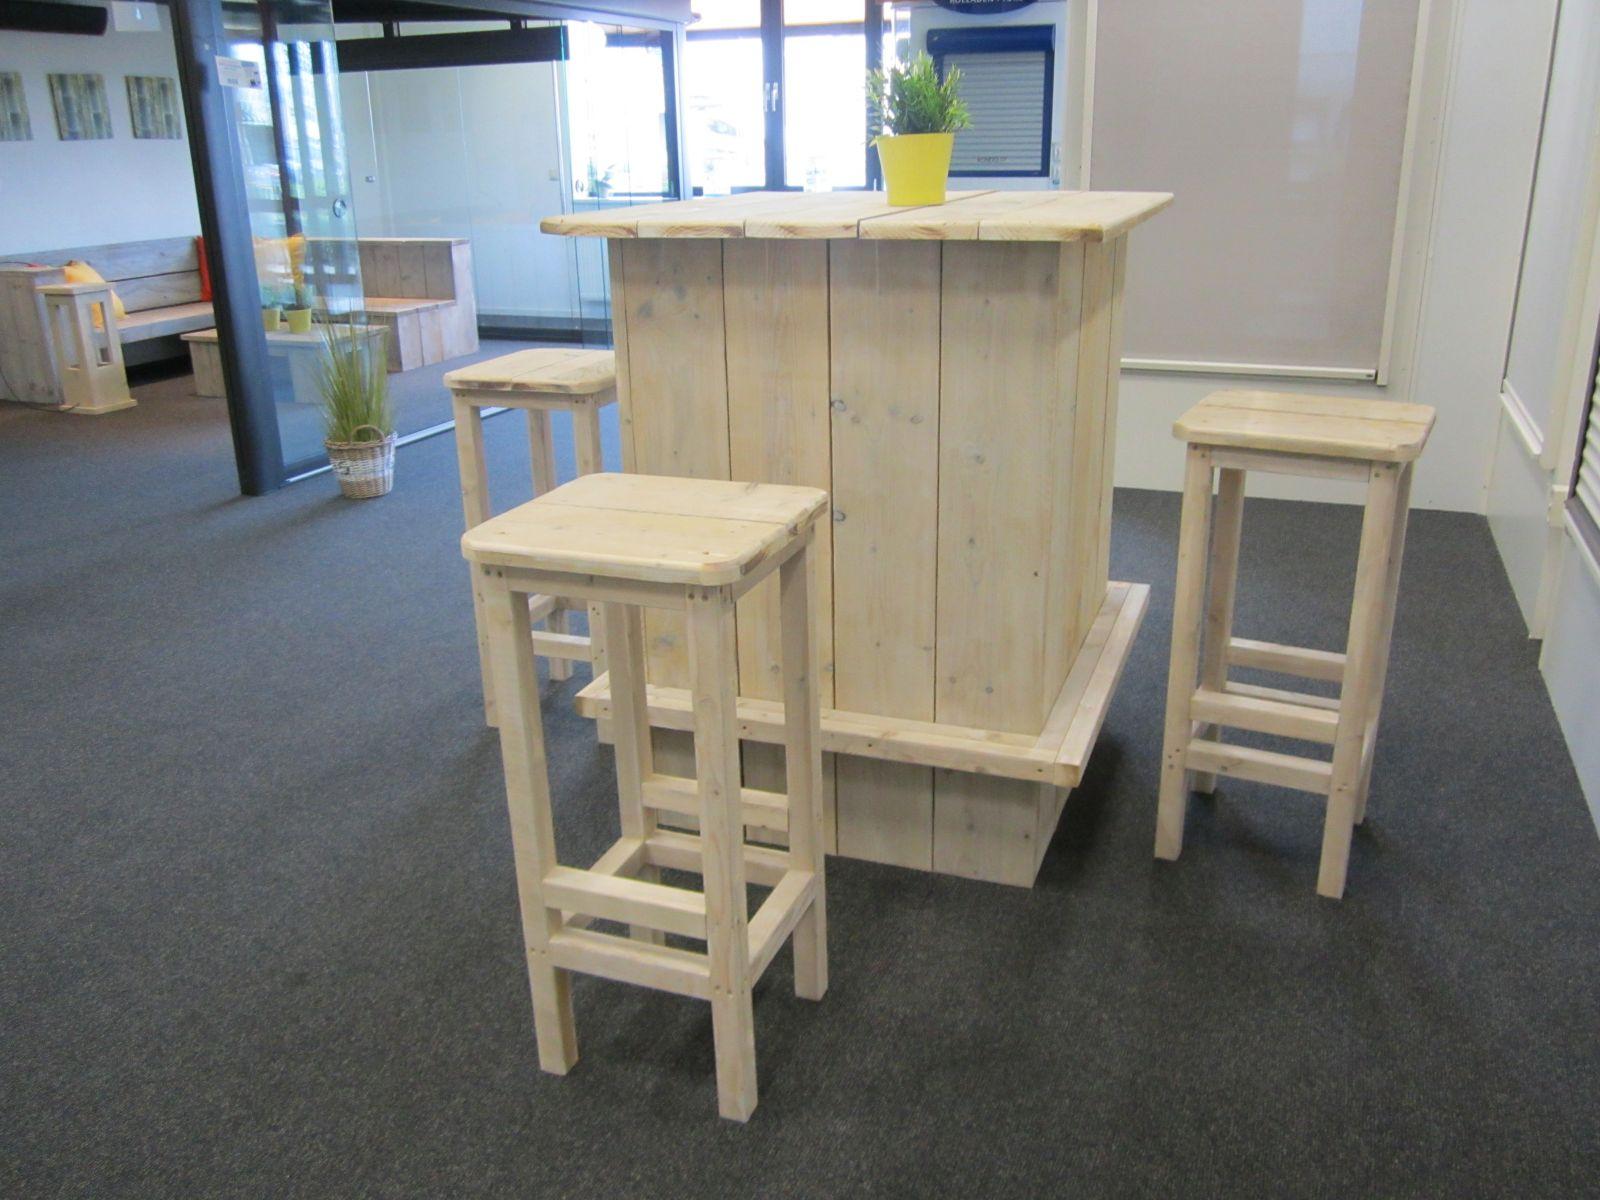 Steigerhouten meubelen Bij Buitink Products   ( Regio Duiven, Arnhem, Doetinchem, Dieren, Didam